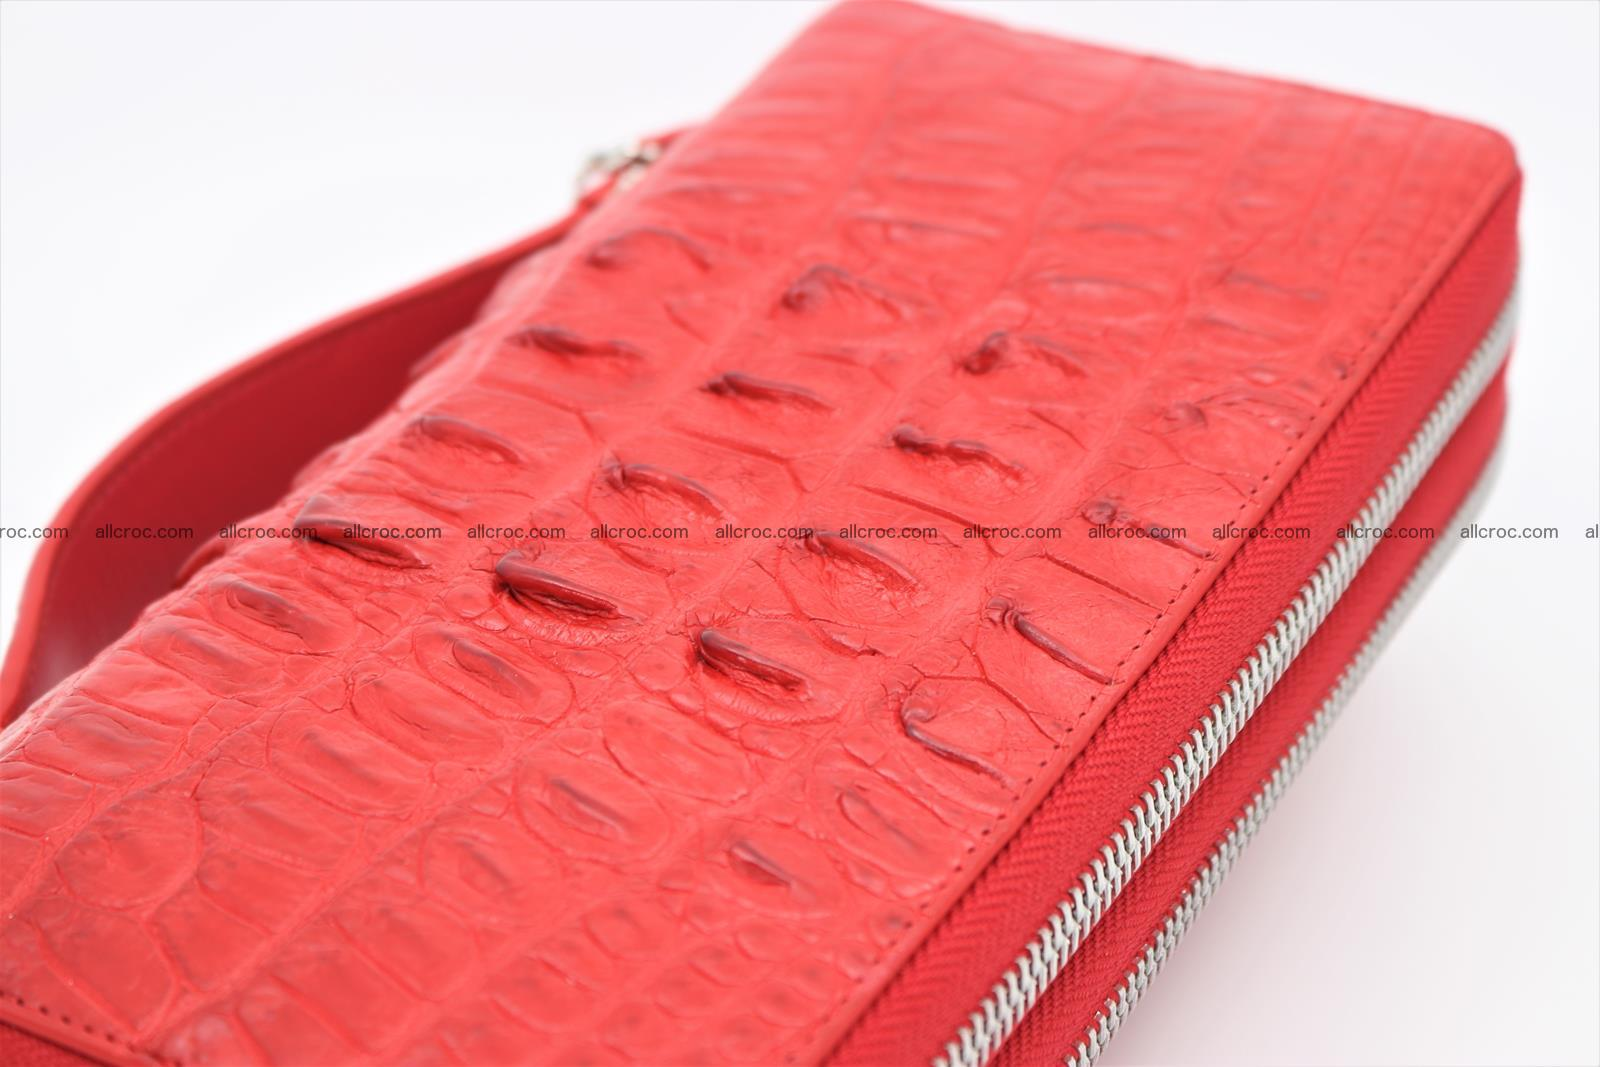 Crocodile skin clutch red color 2 zips 1263 Foto 4